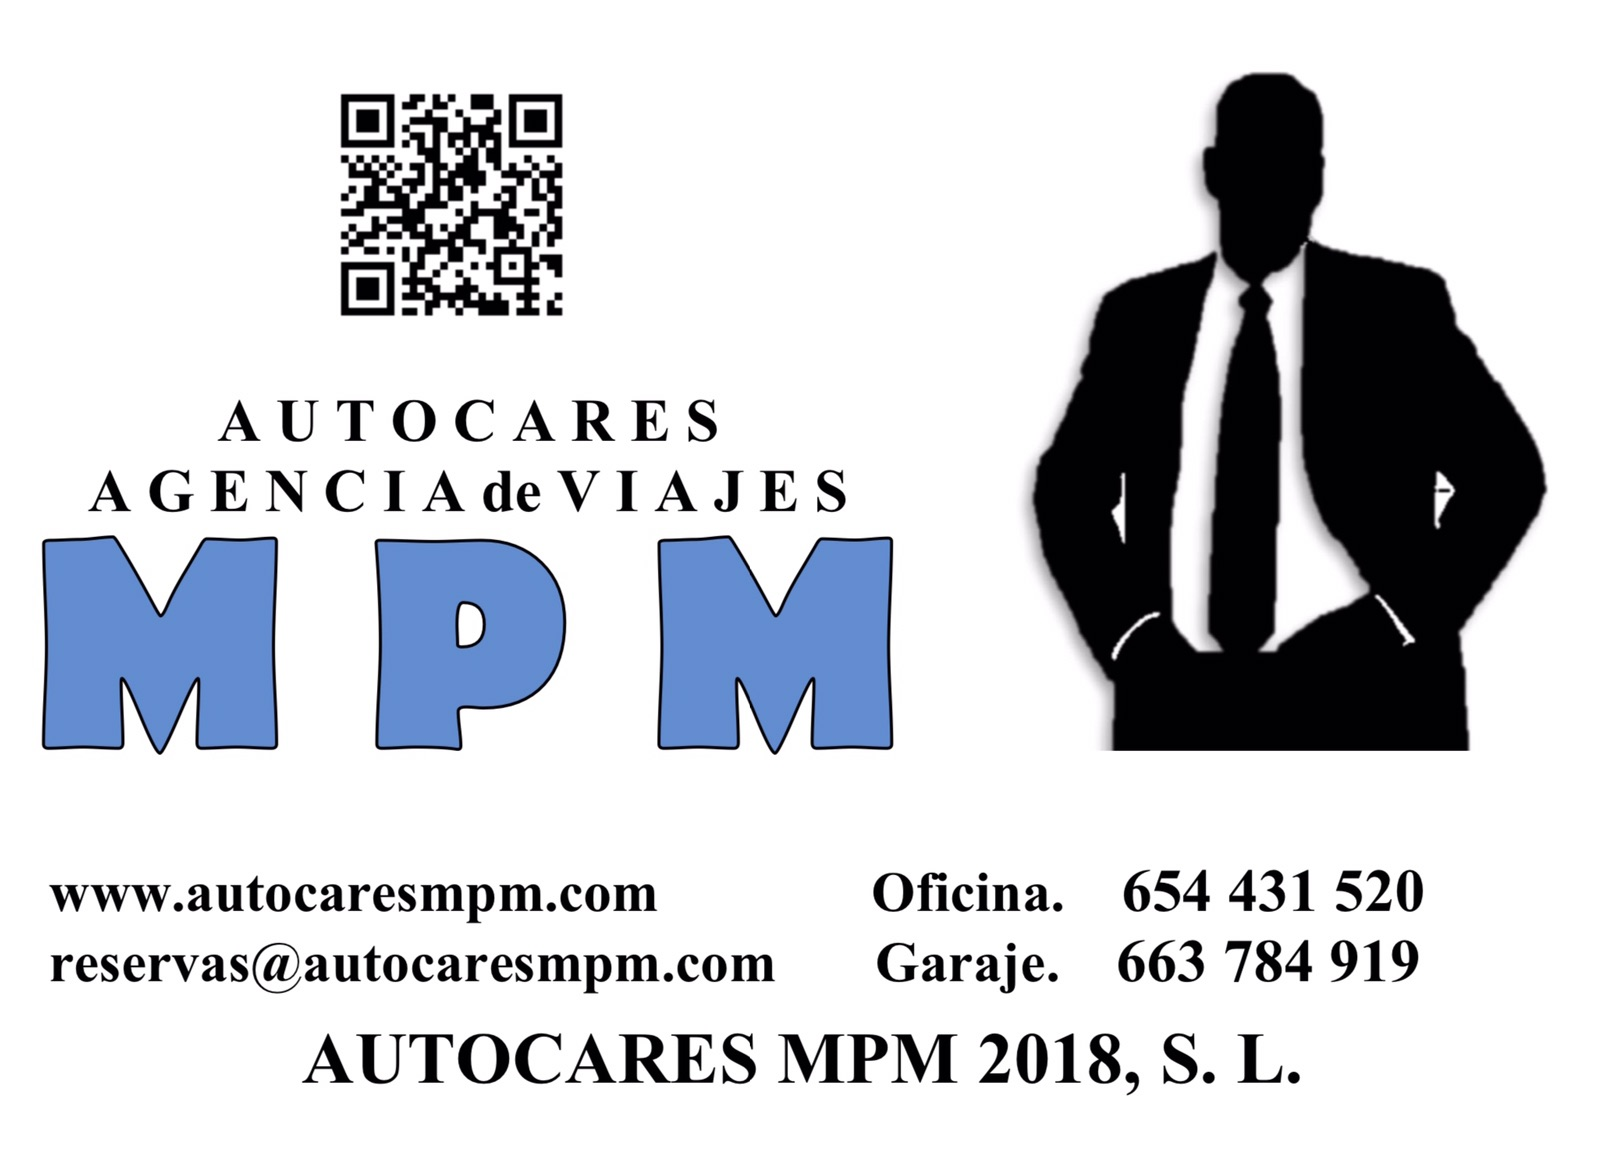 AUTOCARES MPM 2018, SL